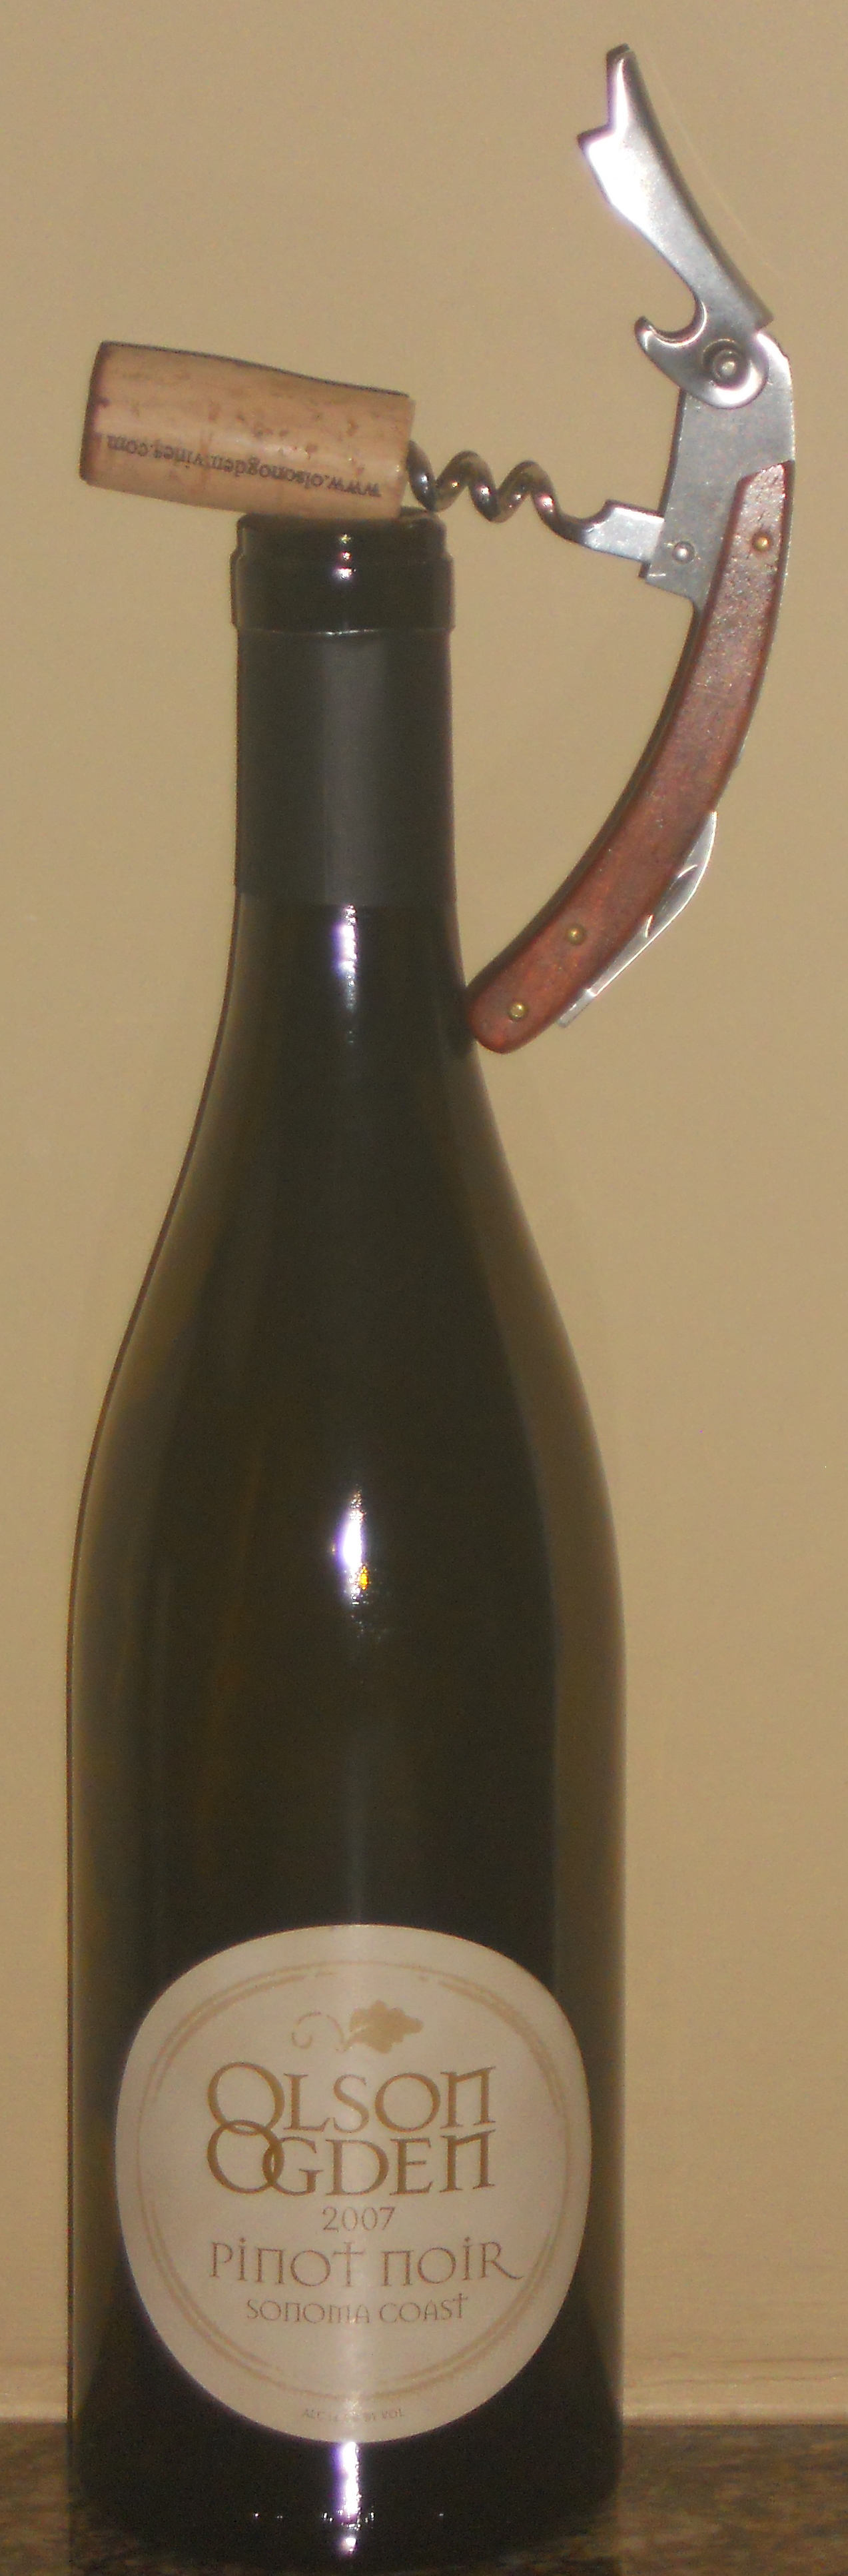 2007 Olson Ogden Pinot Noir, Sonoma, California